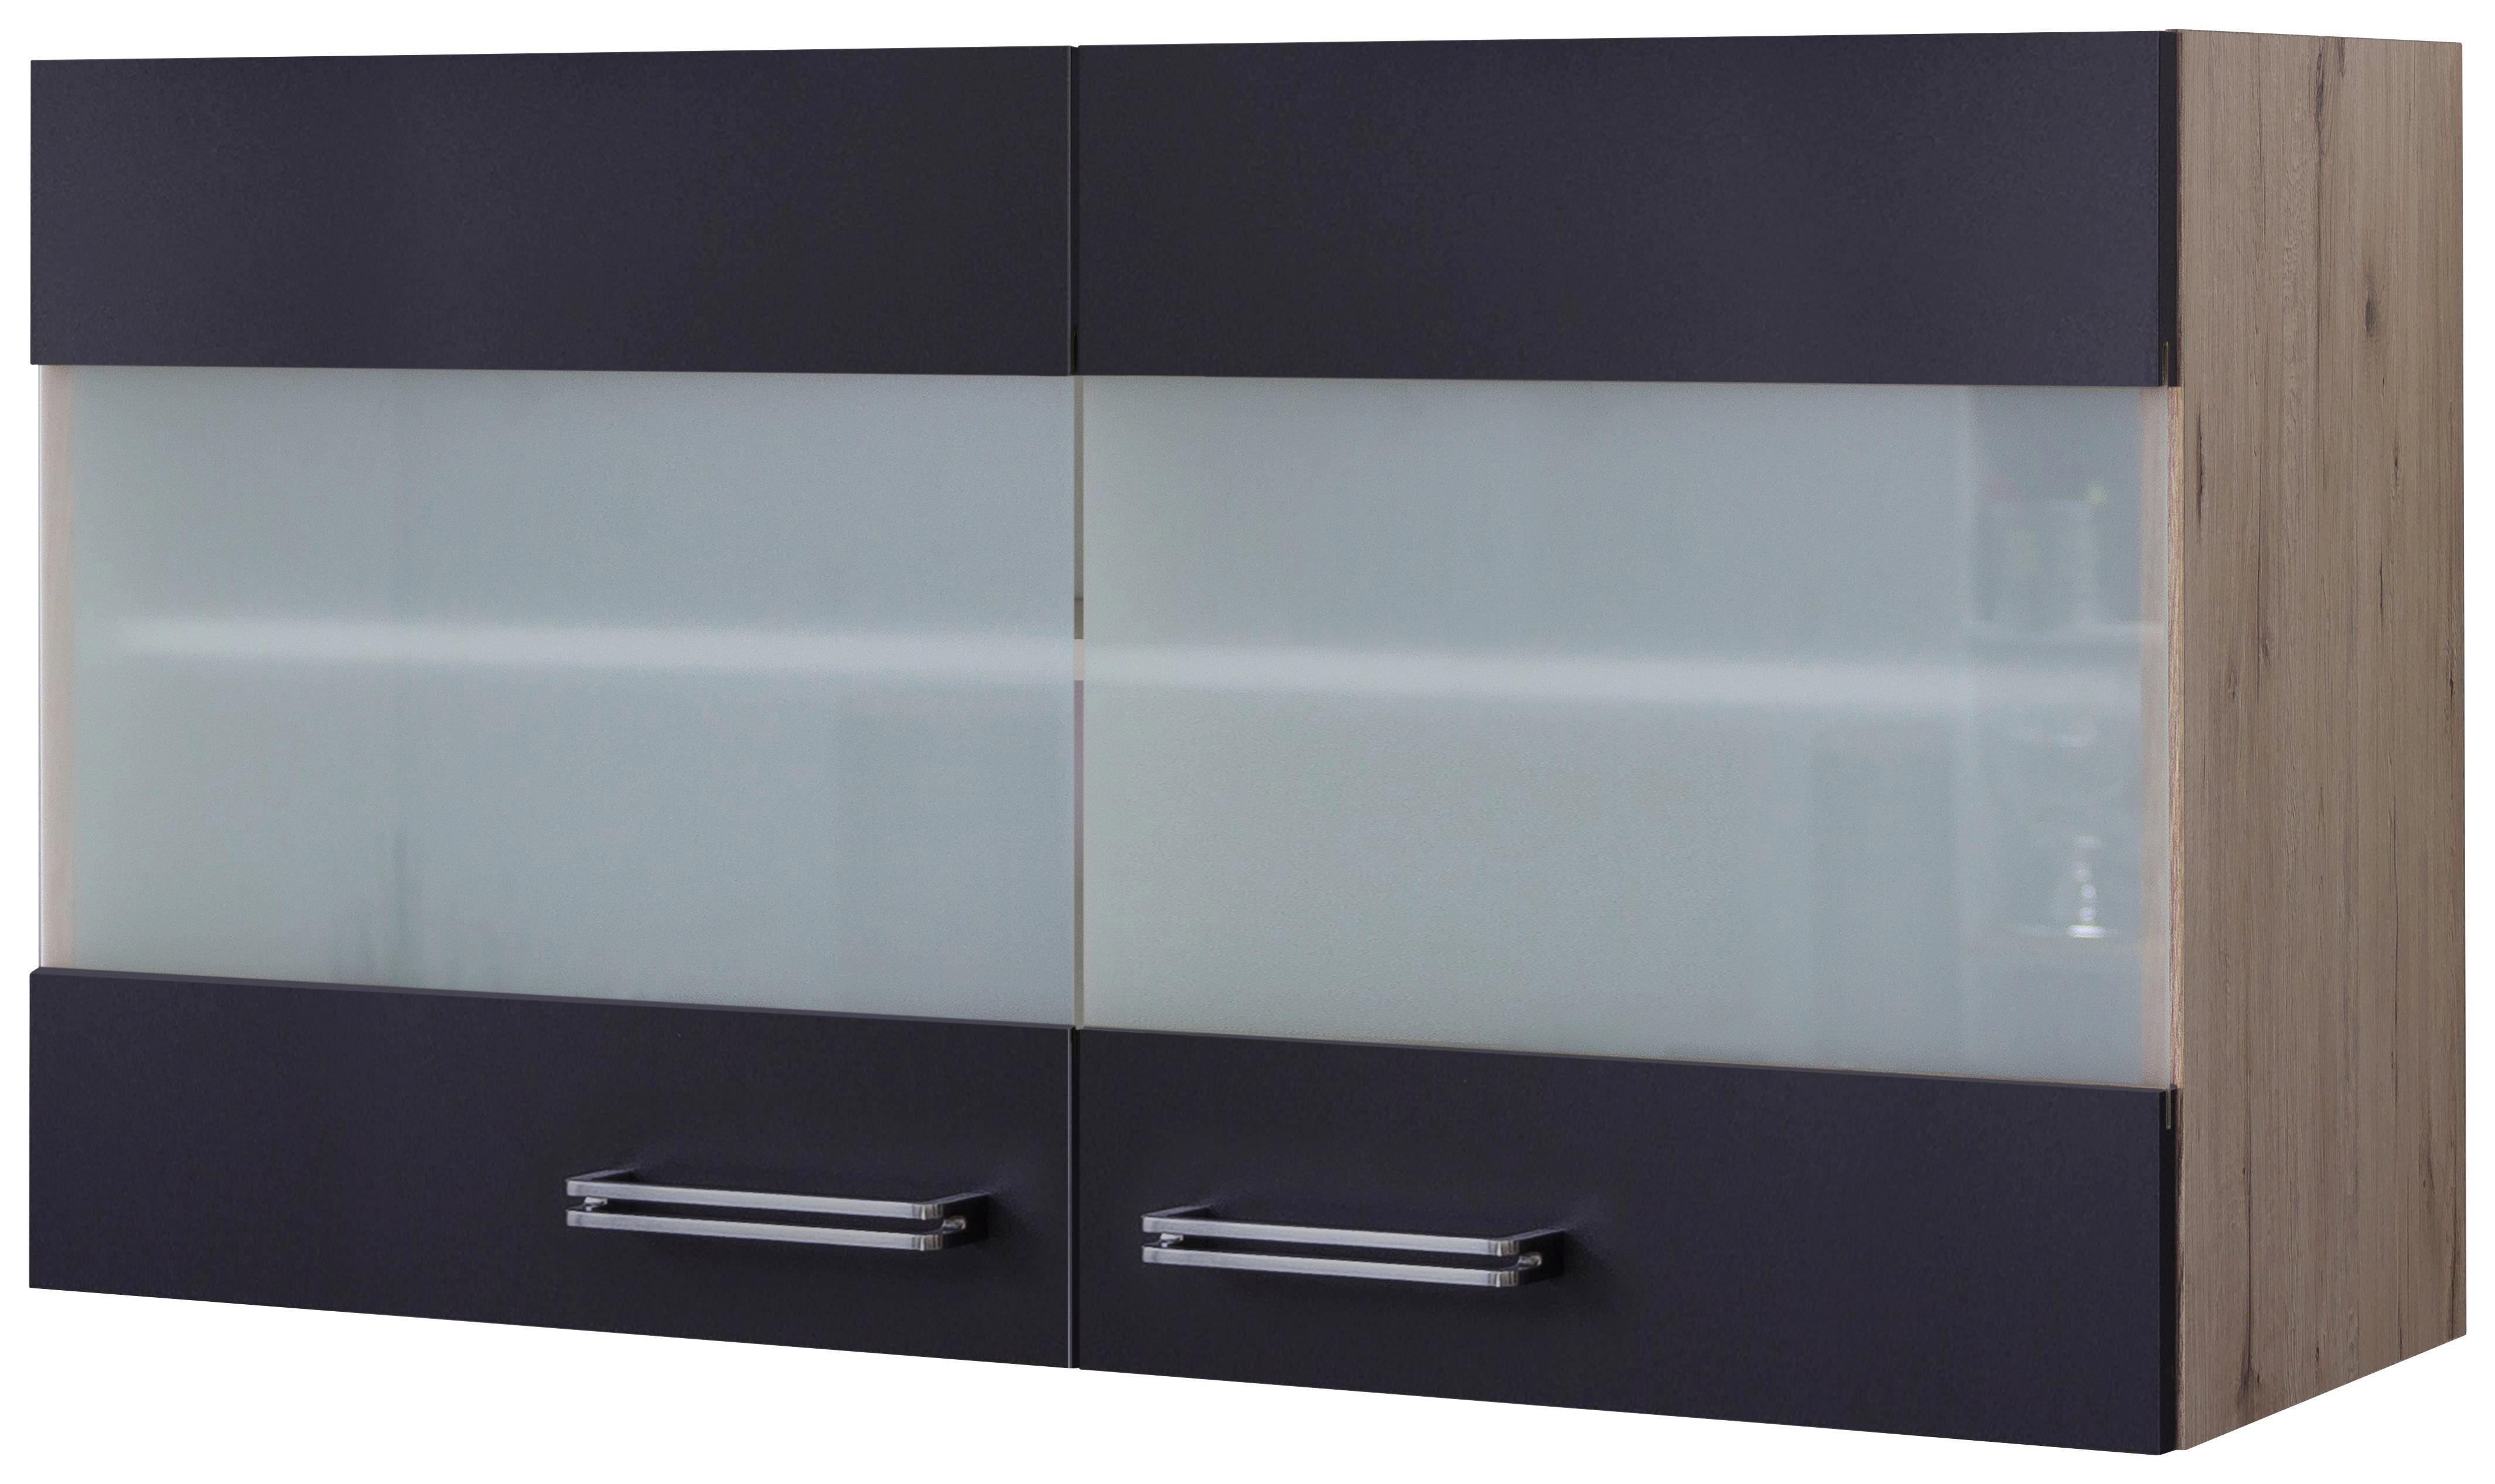 Nett Küchenoberschränke Zum Verkauf Fotos - Küche Set Ideen ...